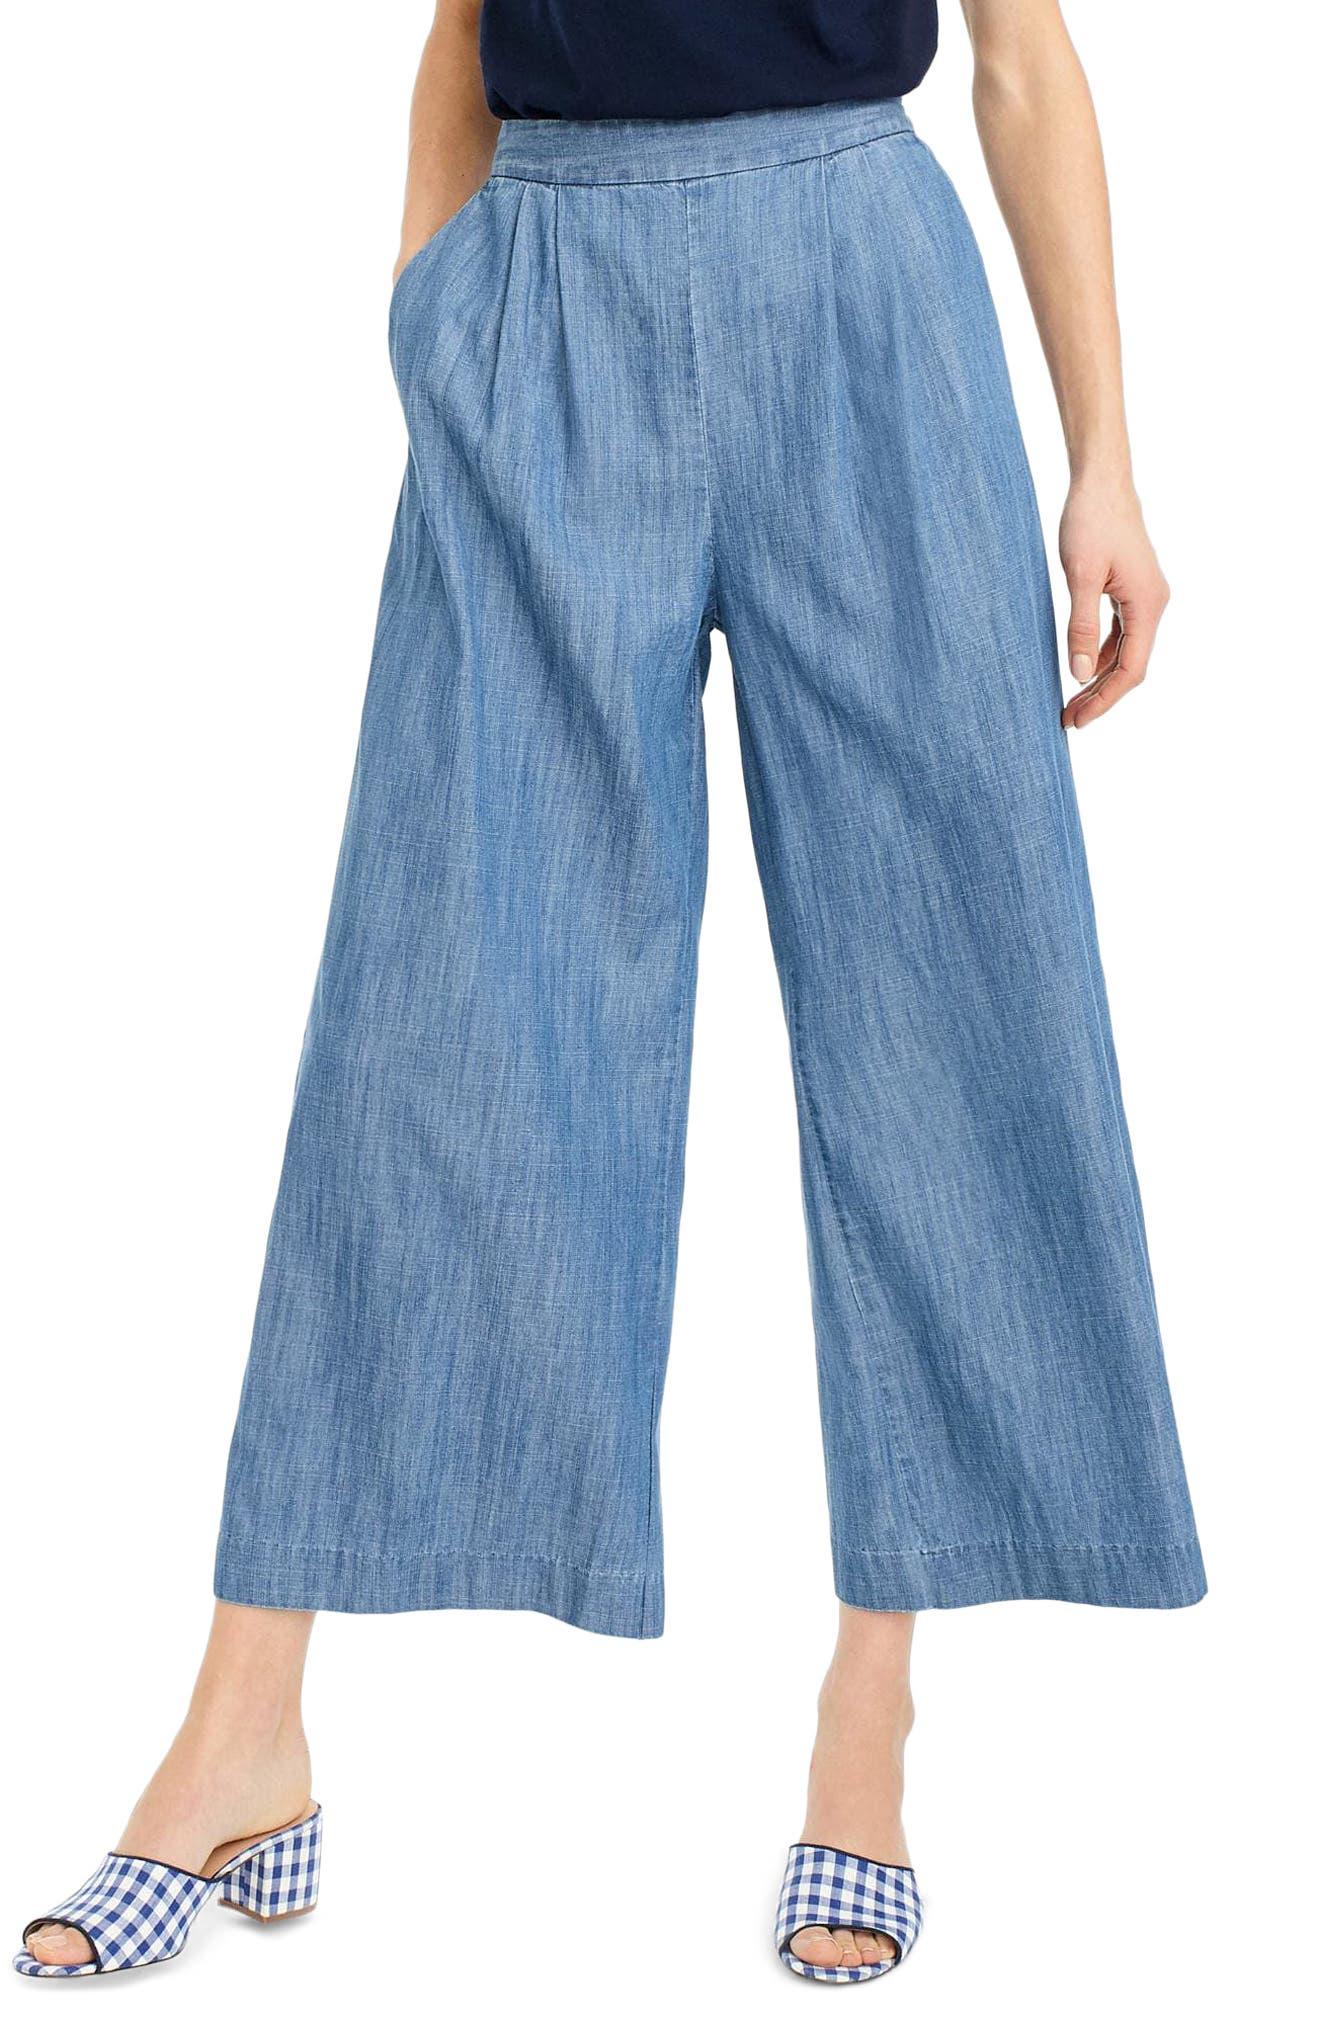 J.Crew Wide Leg Crop Chambray Pants (Regular & Petite)